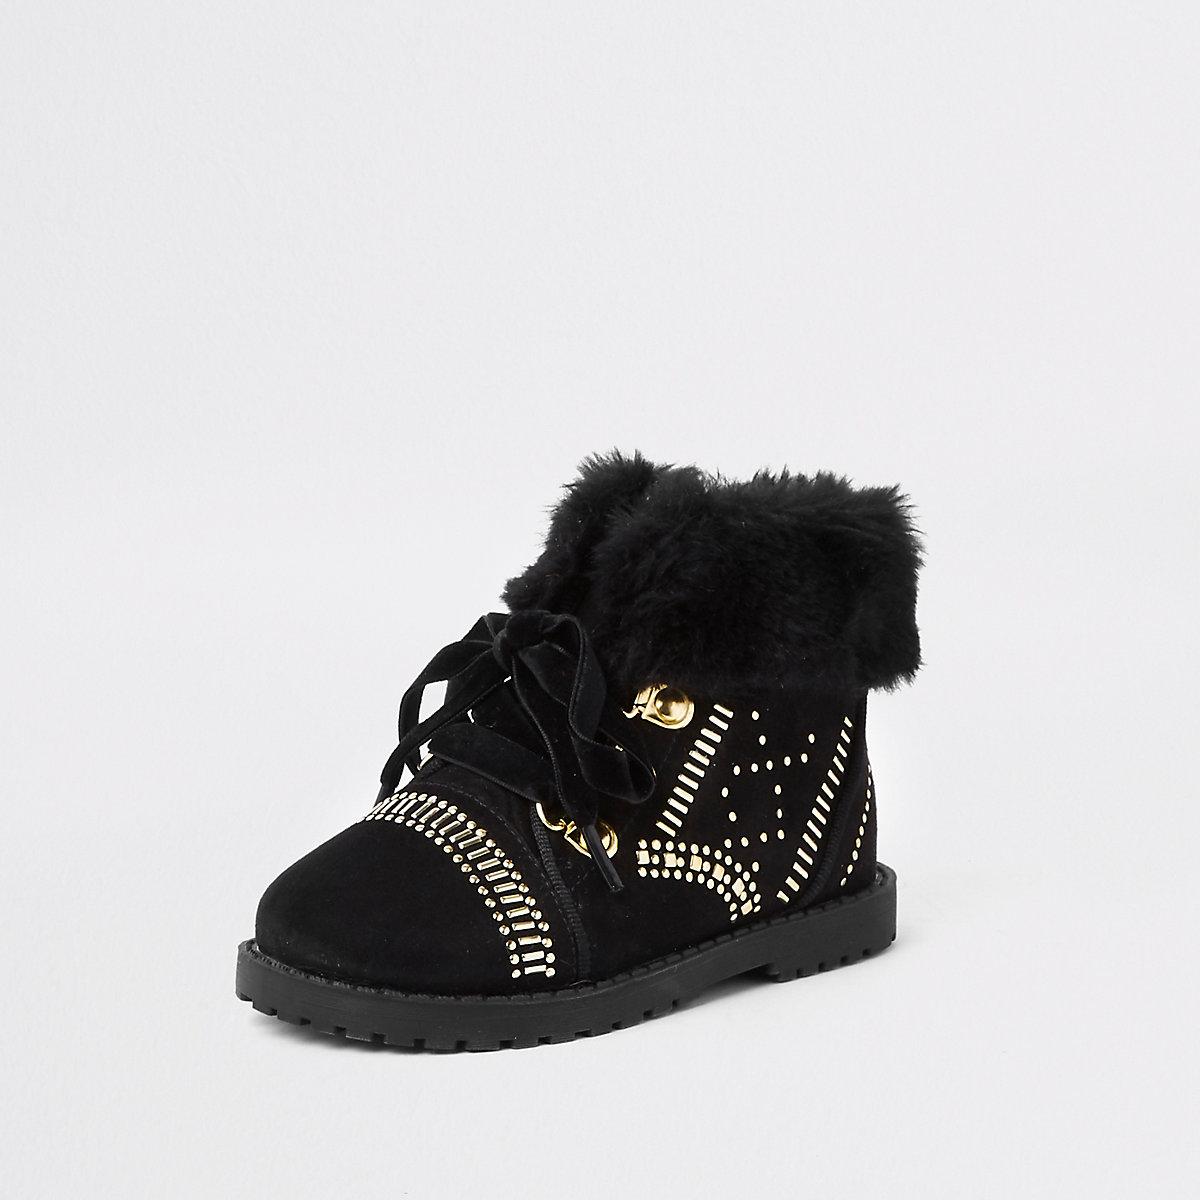 1543133becf86 RI 30 mini girls black faux fur studded boot - Baby Girls Boots ...